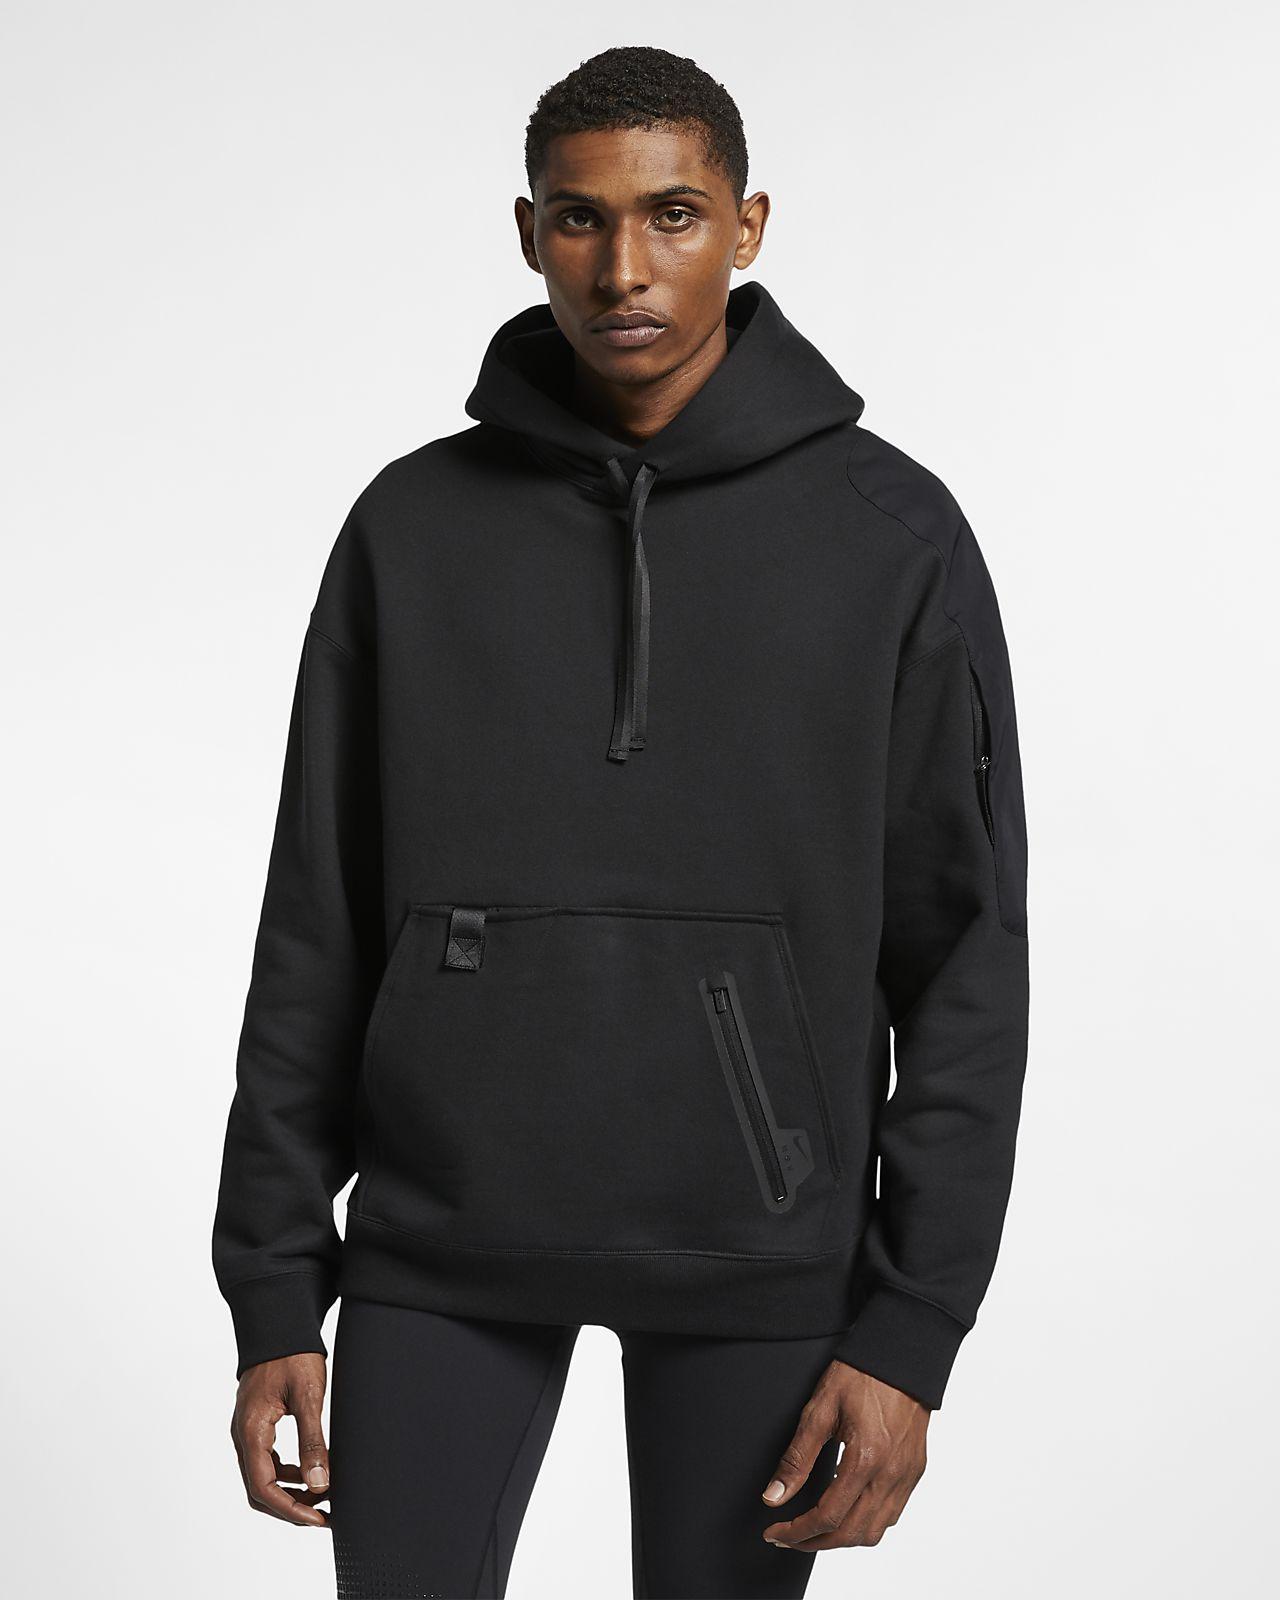 Nike x MMW 男款套頭連帽上衣